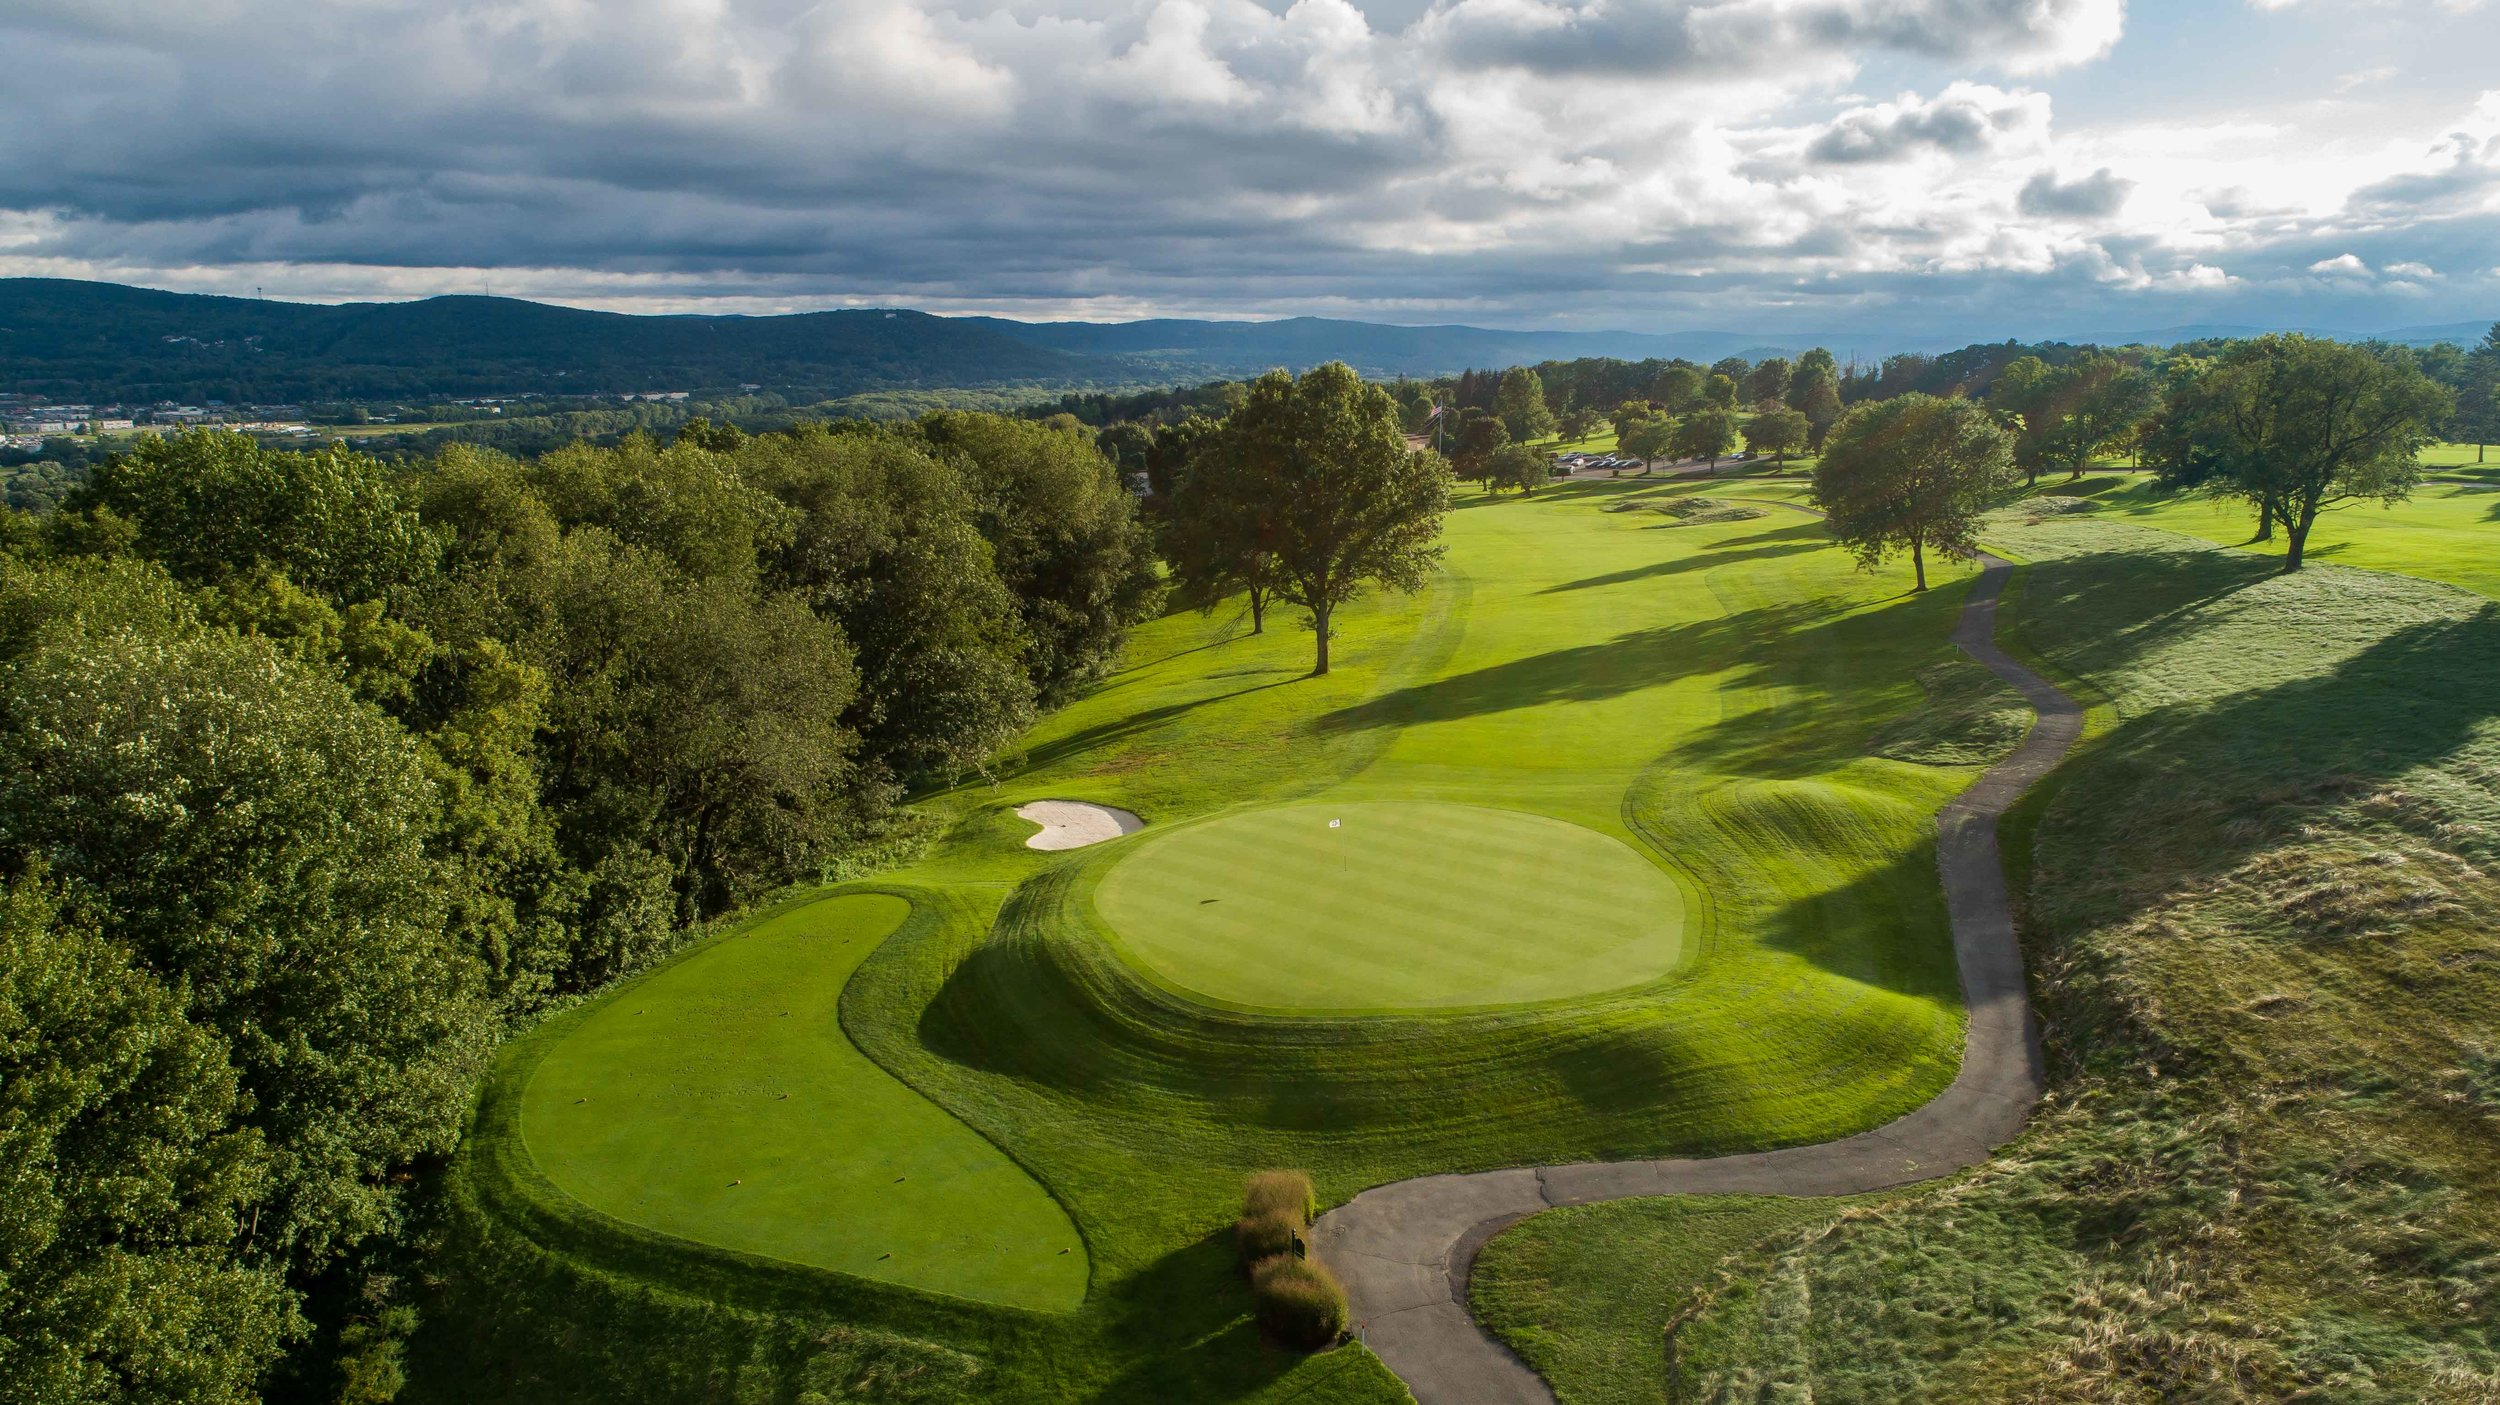 Binghamton Country Club in New York